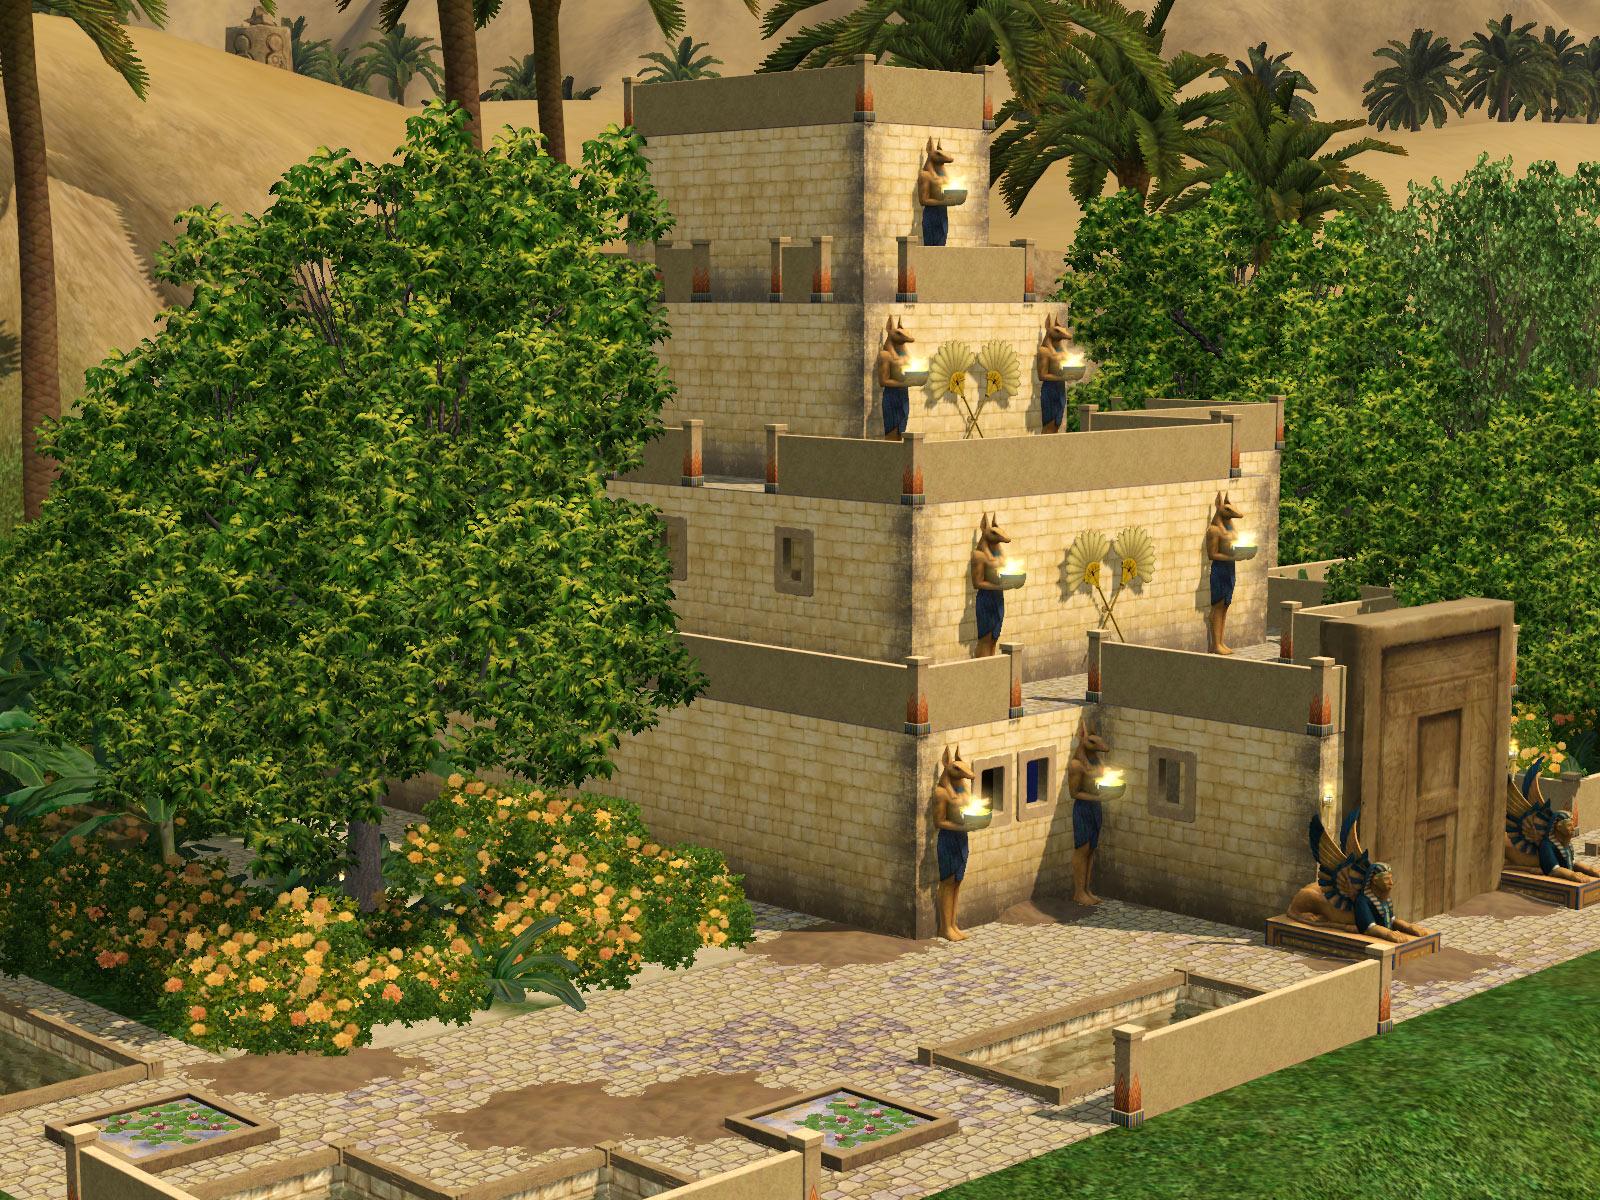 parsimonious the sims 3 houses. Black Bedroom Furniture Sets. Home Design Ideas